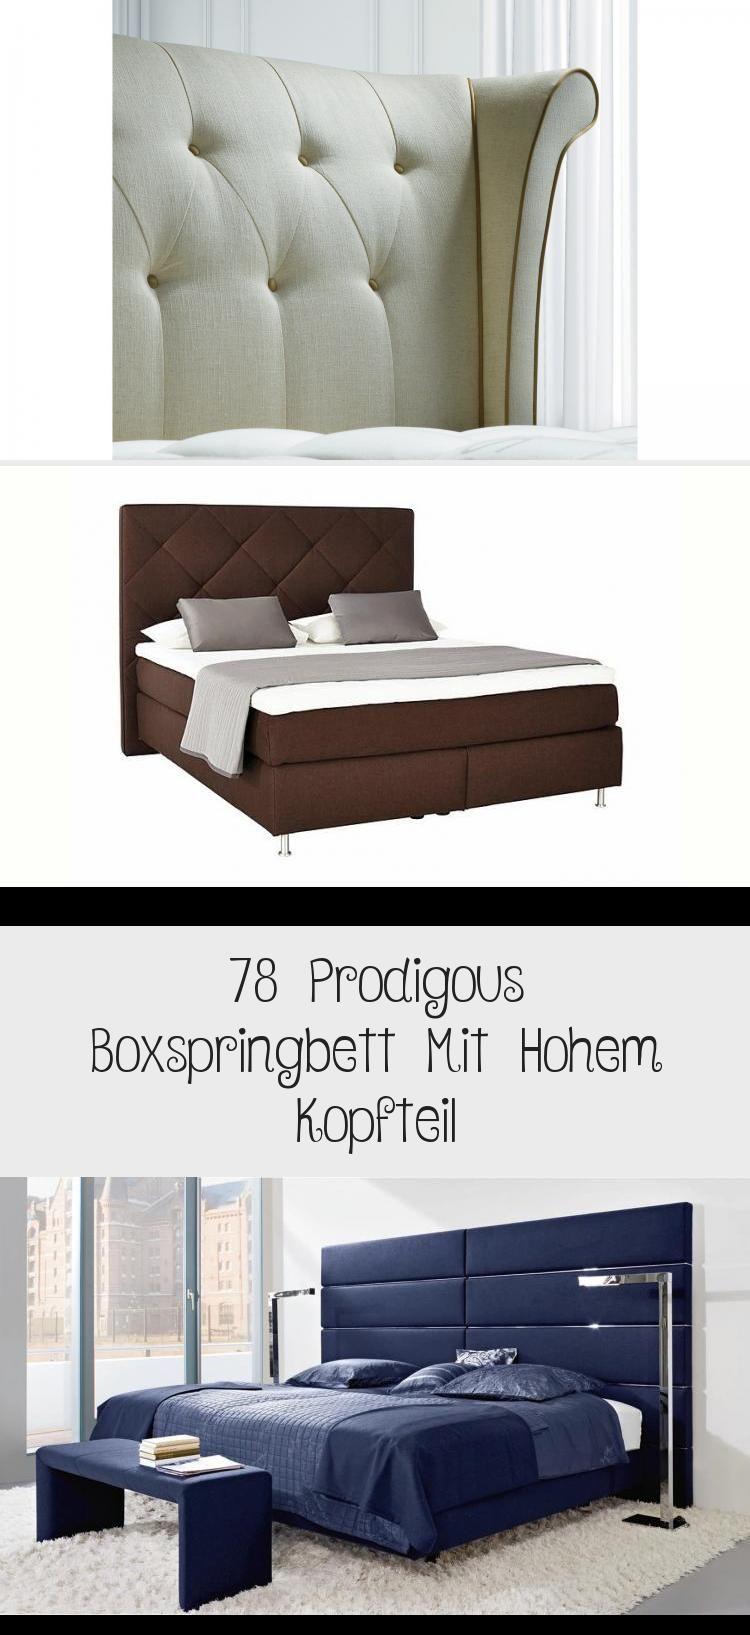 78 Prodigous Boxspringbett Mit Hohem Kopfteil Home Decor Decor Furniture